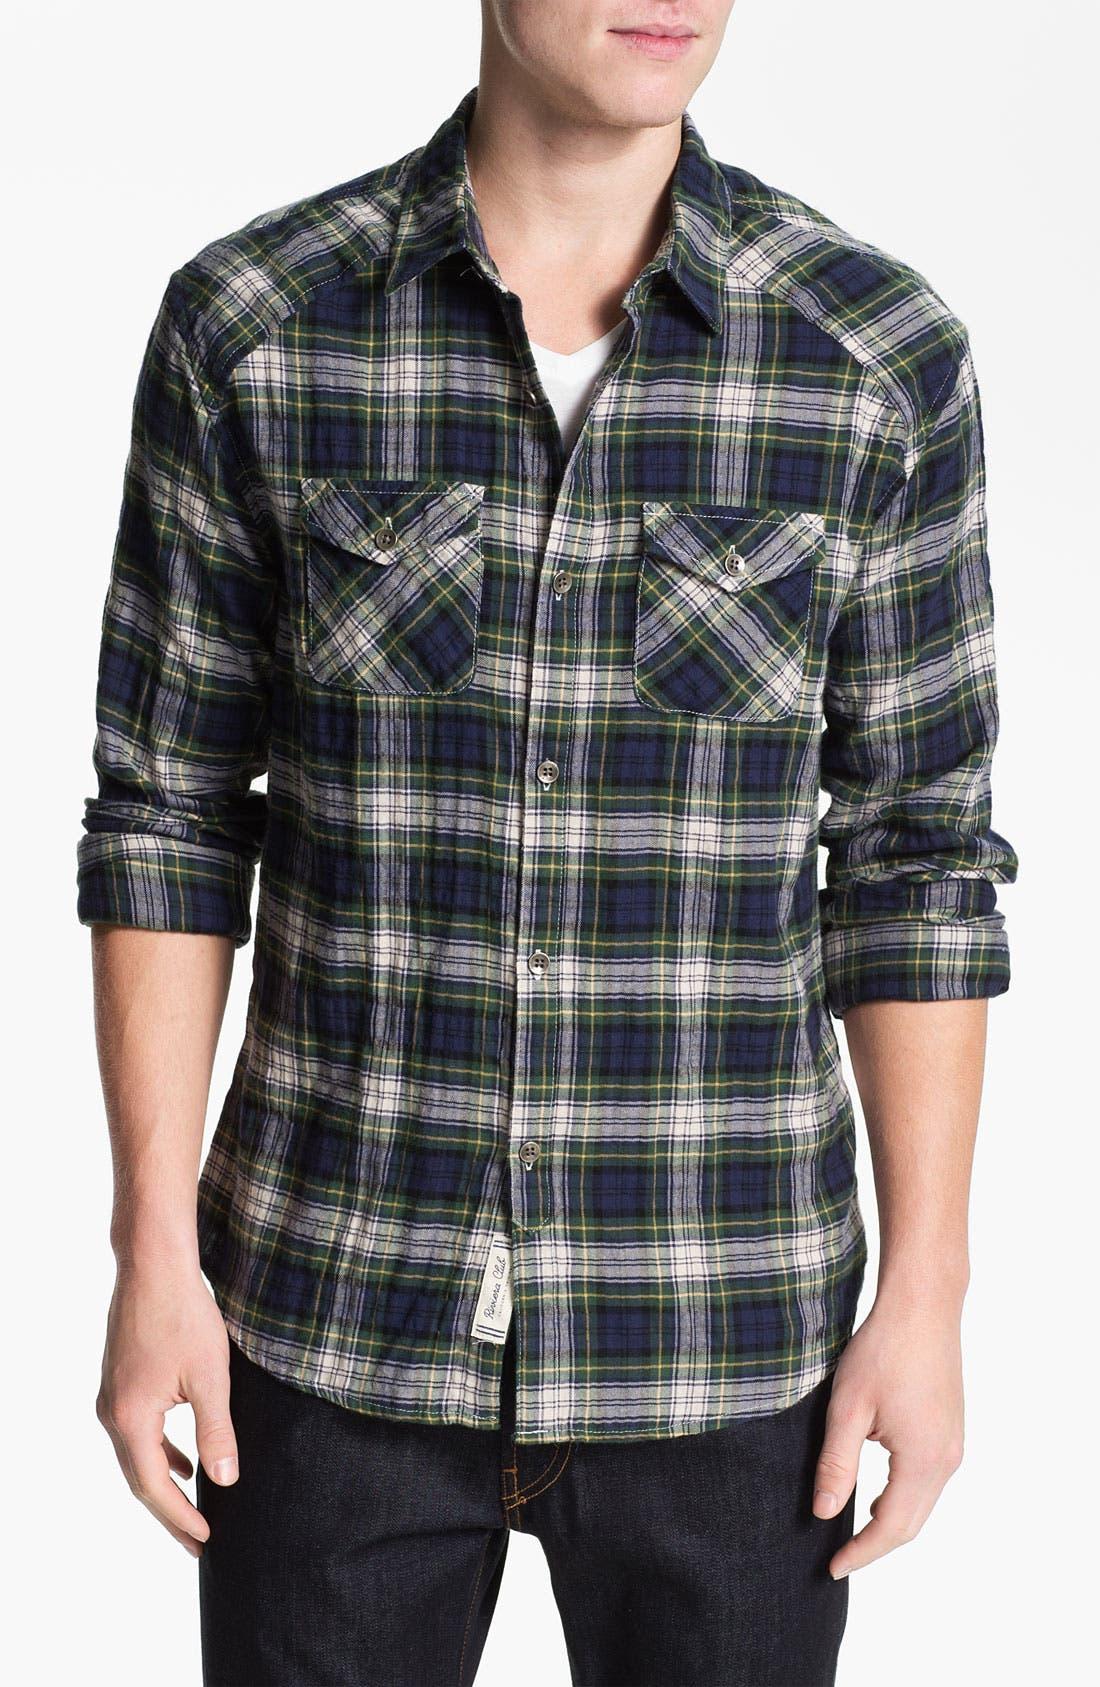 Main Image - Riviera Club Country Plaid Herringbone Flannel Shirt